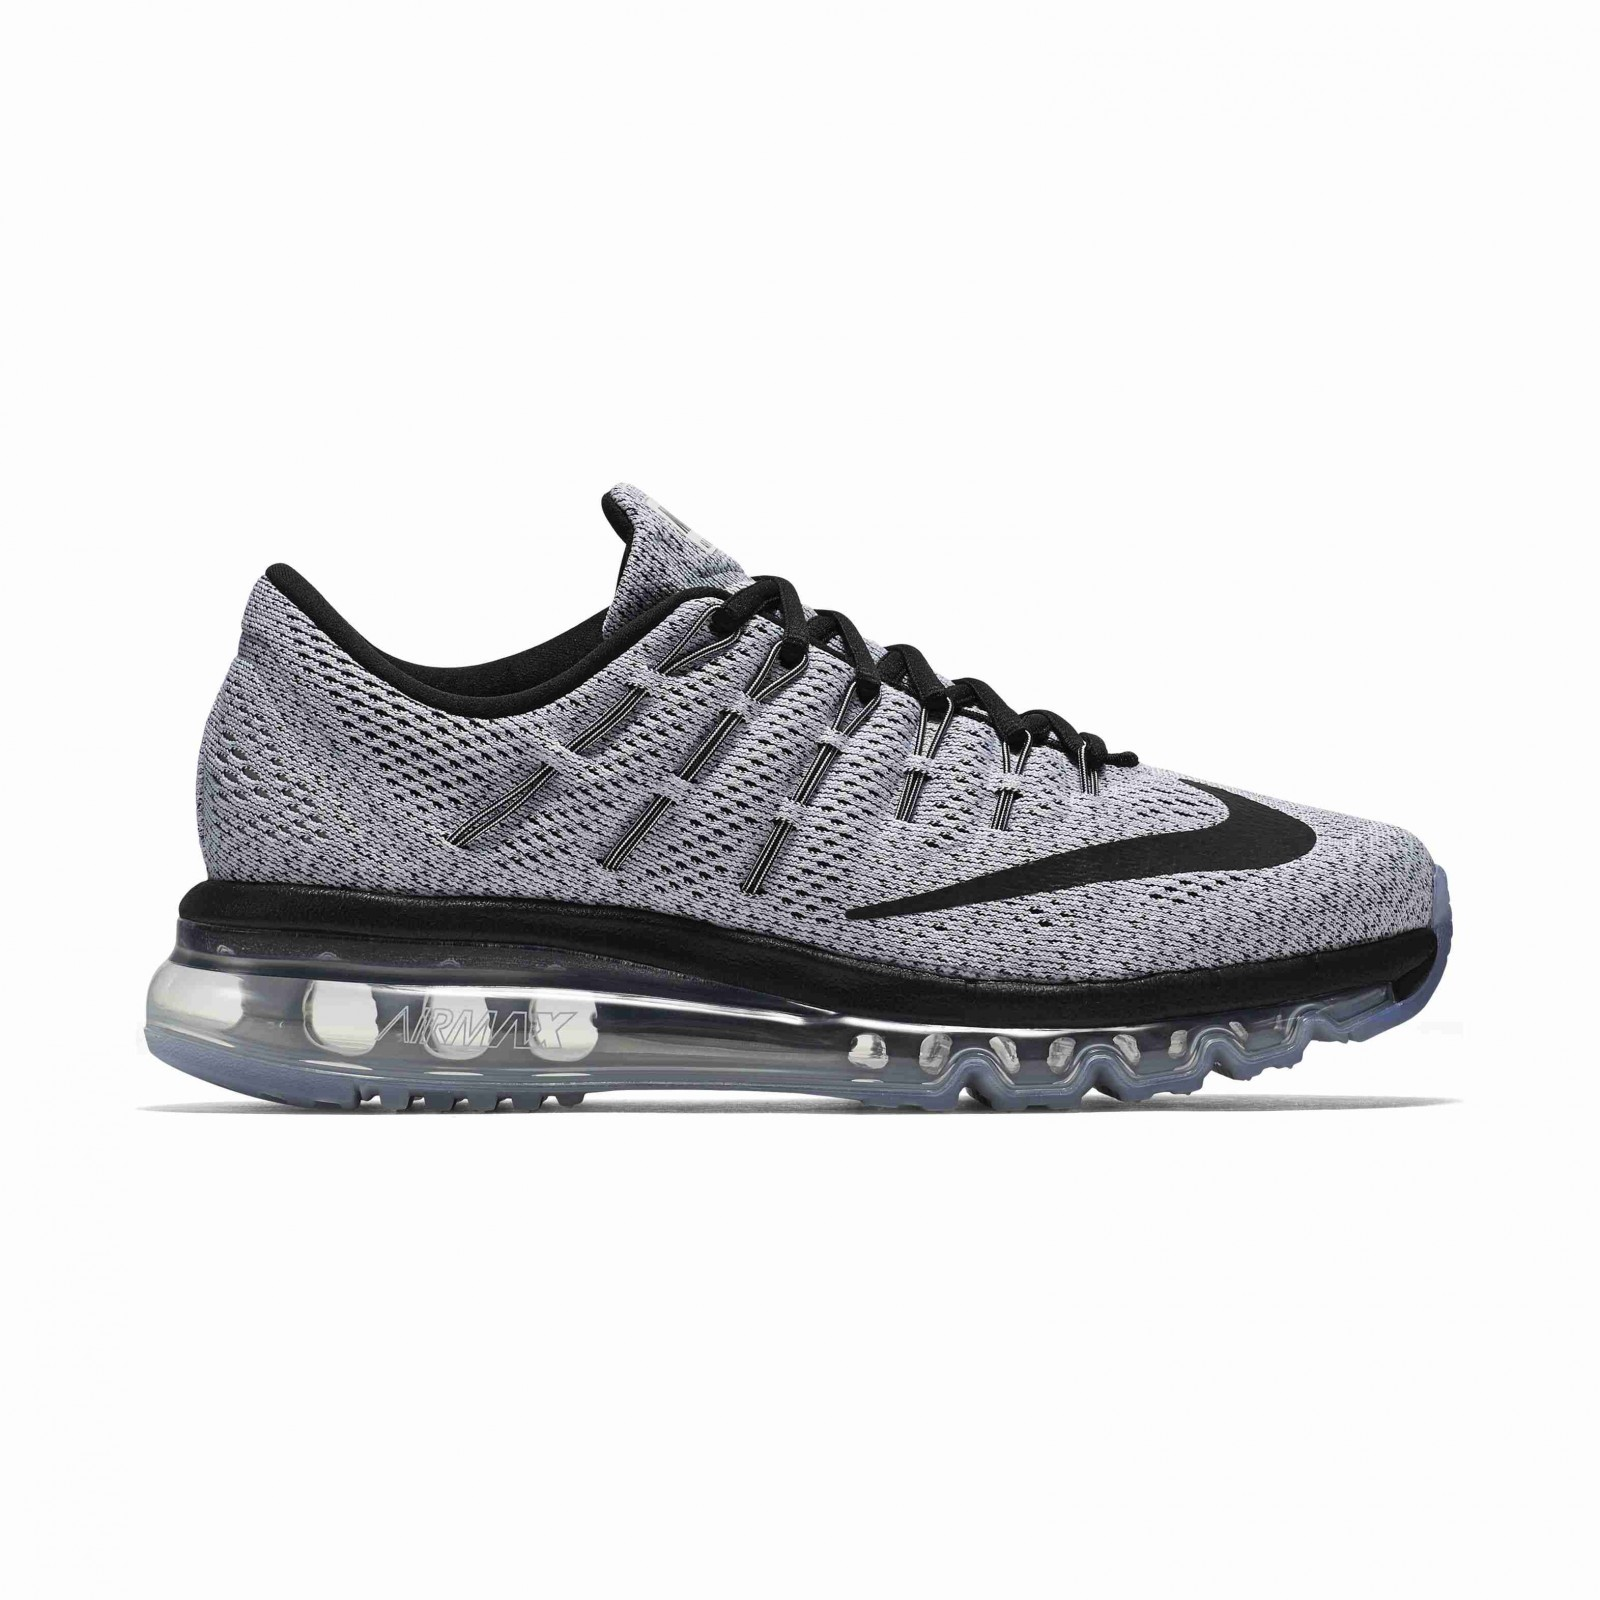 Dámské boty Nike WMNS AIR MAX 2016 šedo-černé  3364a81f219